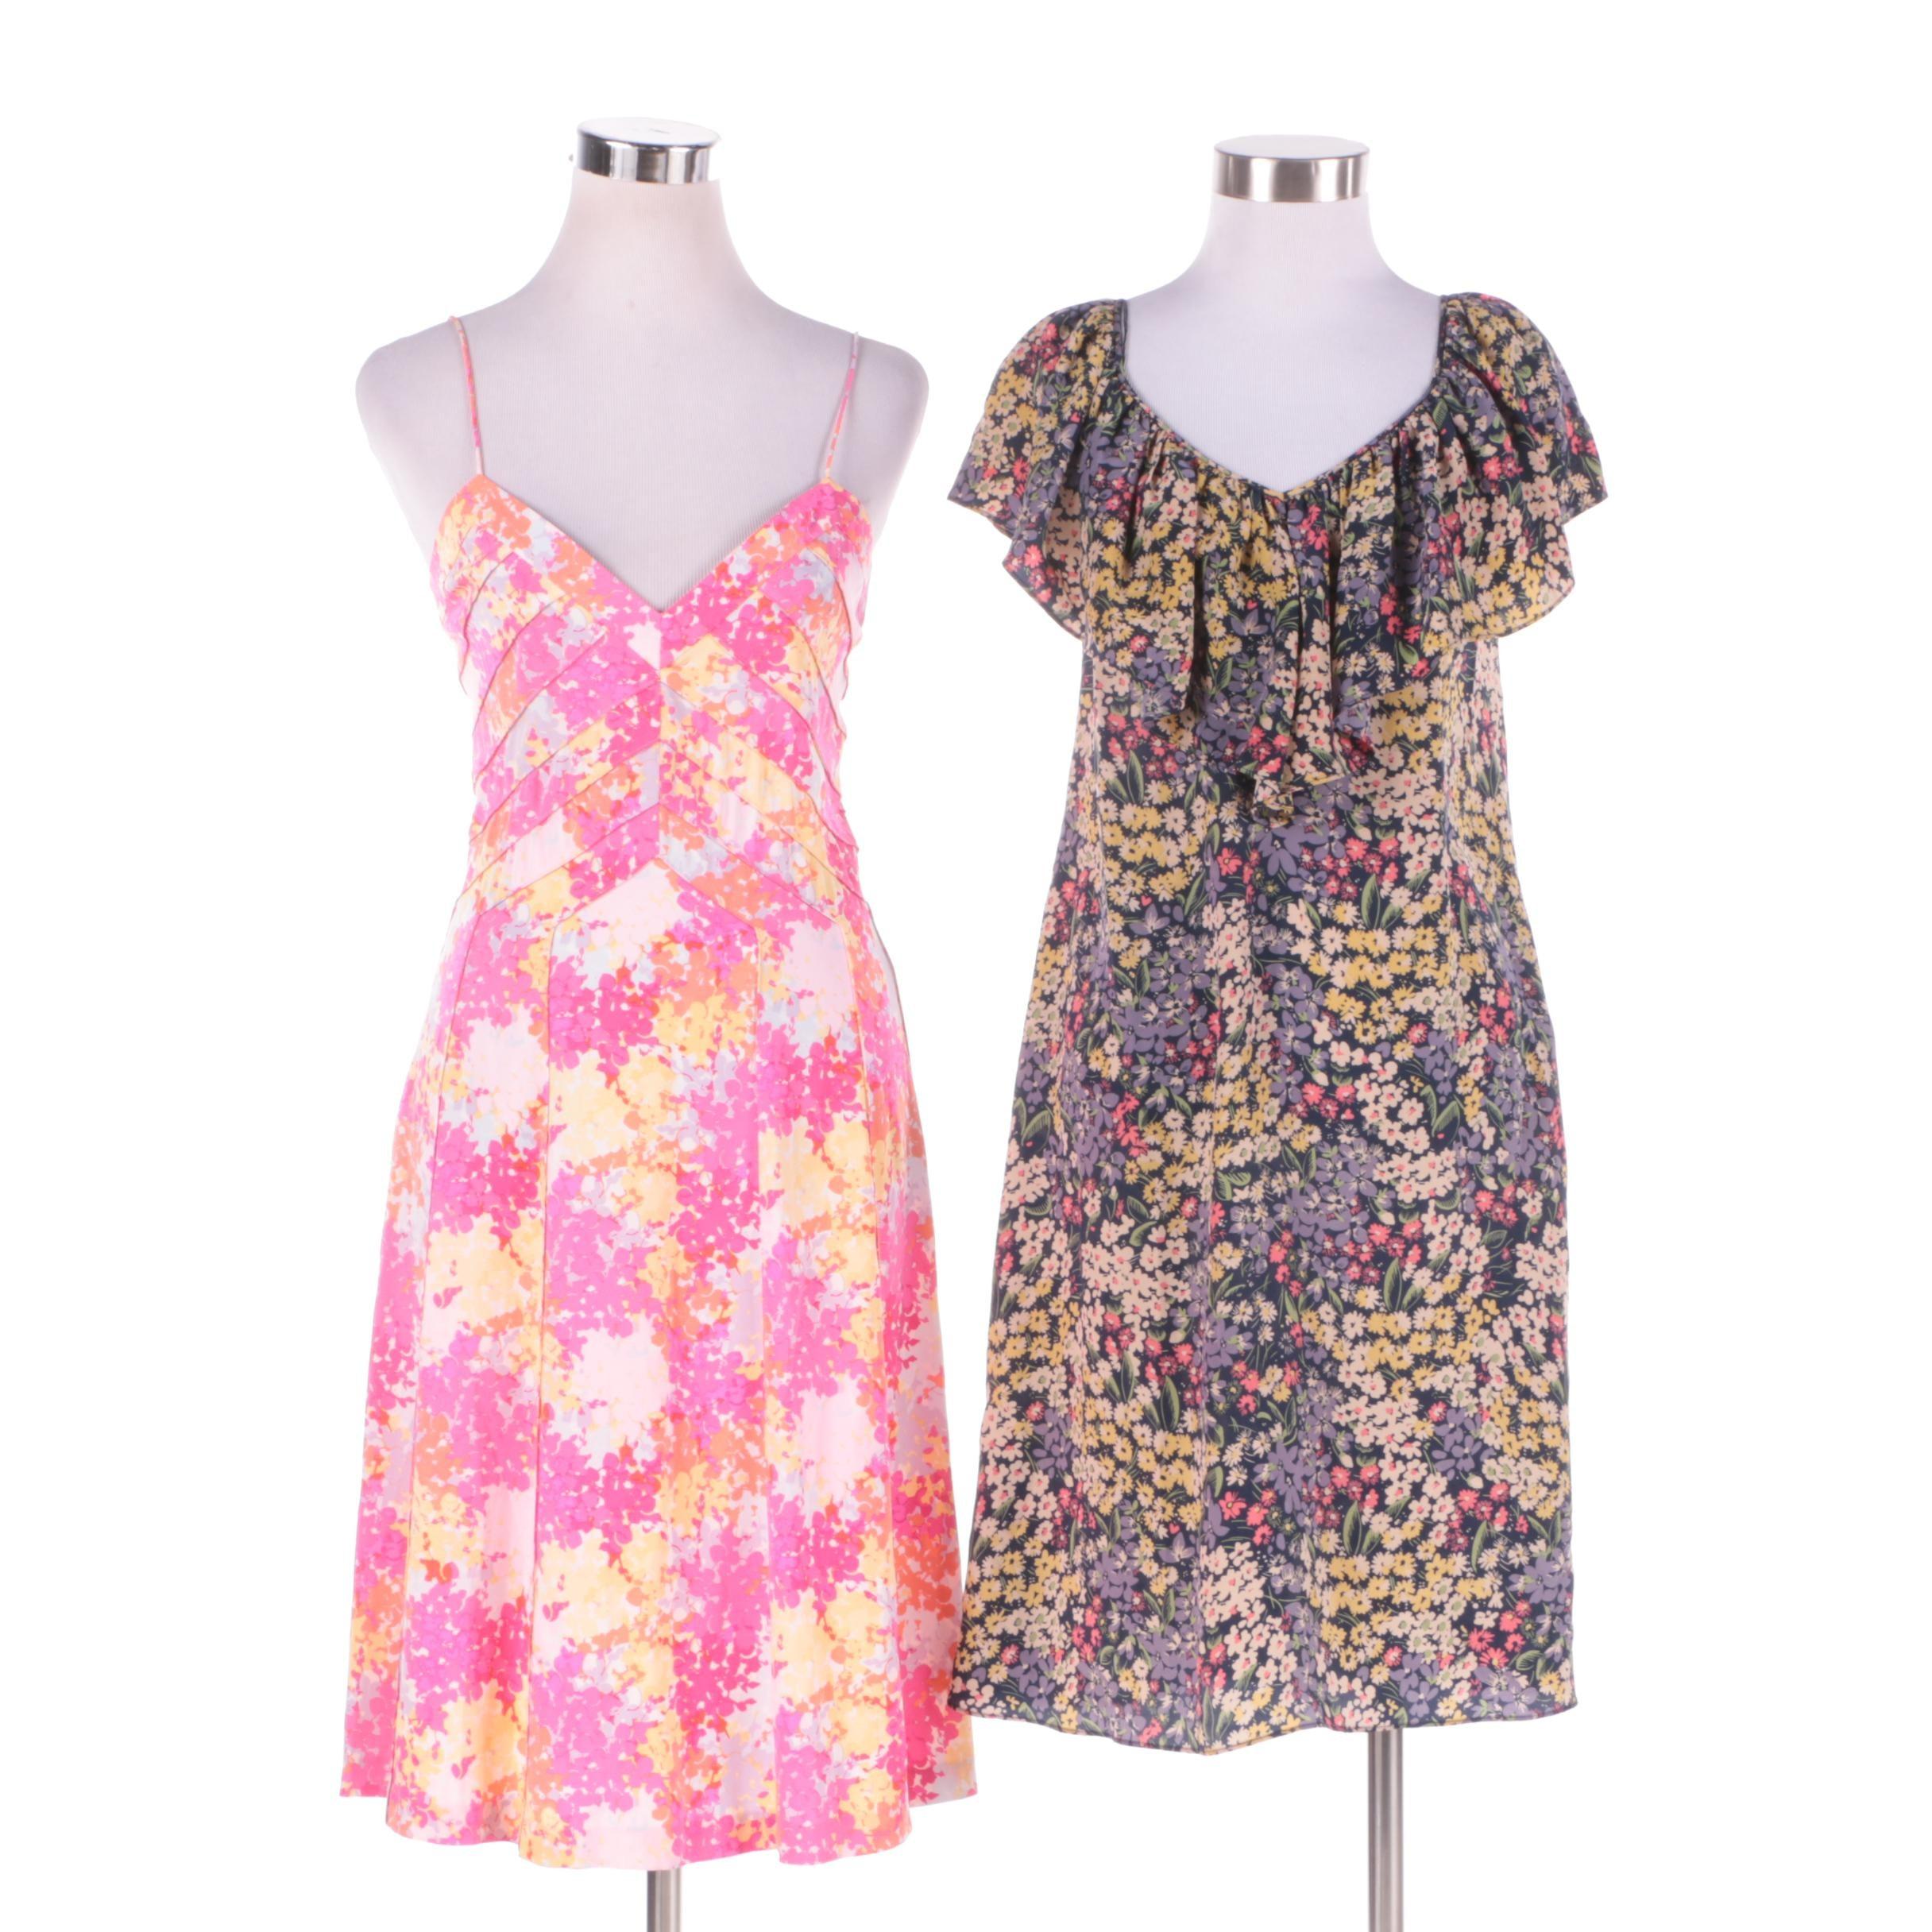 Rebecca Taylor and Diane von Furstenberg Silk Floral Print Dresses